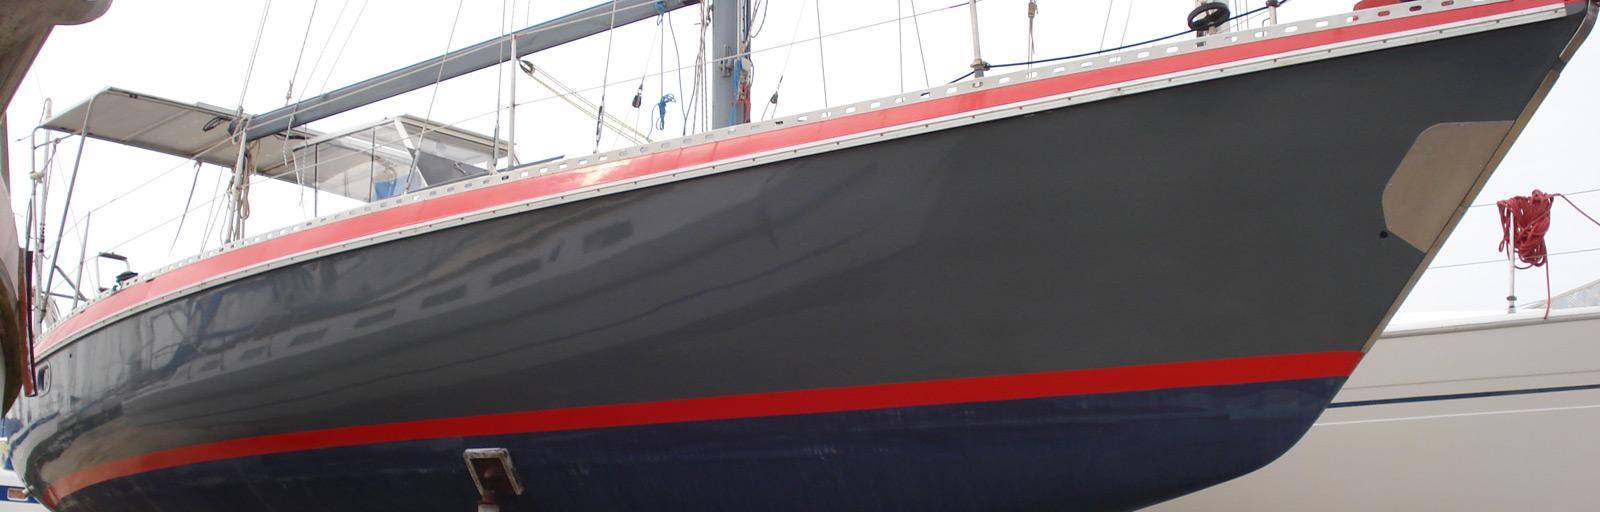 Gib Sea 105 - AYC Yachtbroker